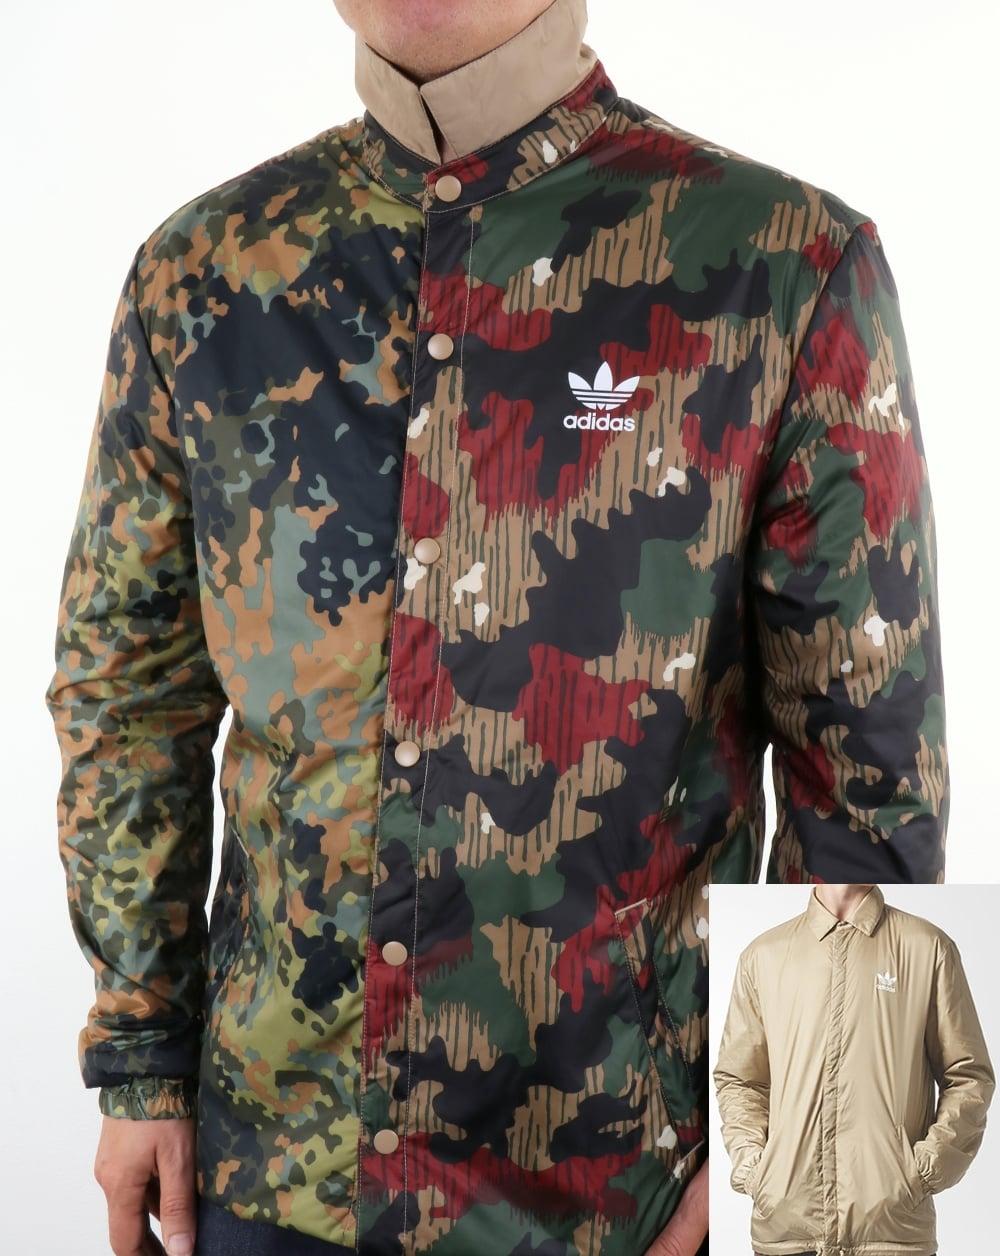 Adidas Originals Pharrell Williams Hu Hiking Reversible Camo Coach Jacket